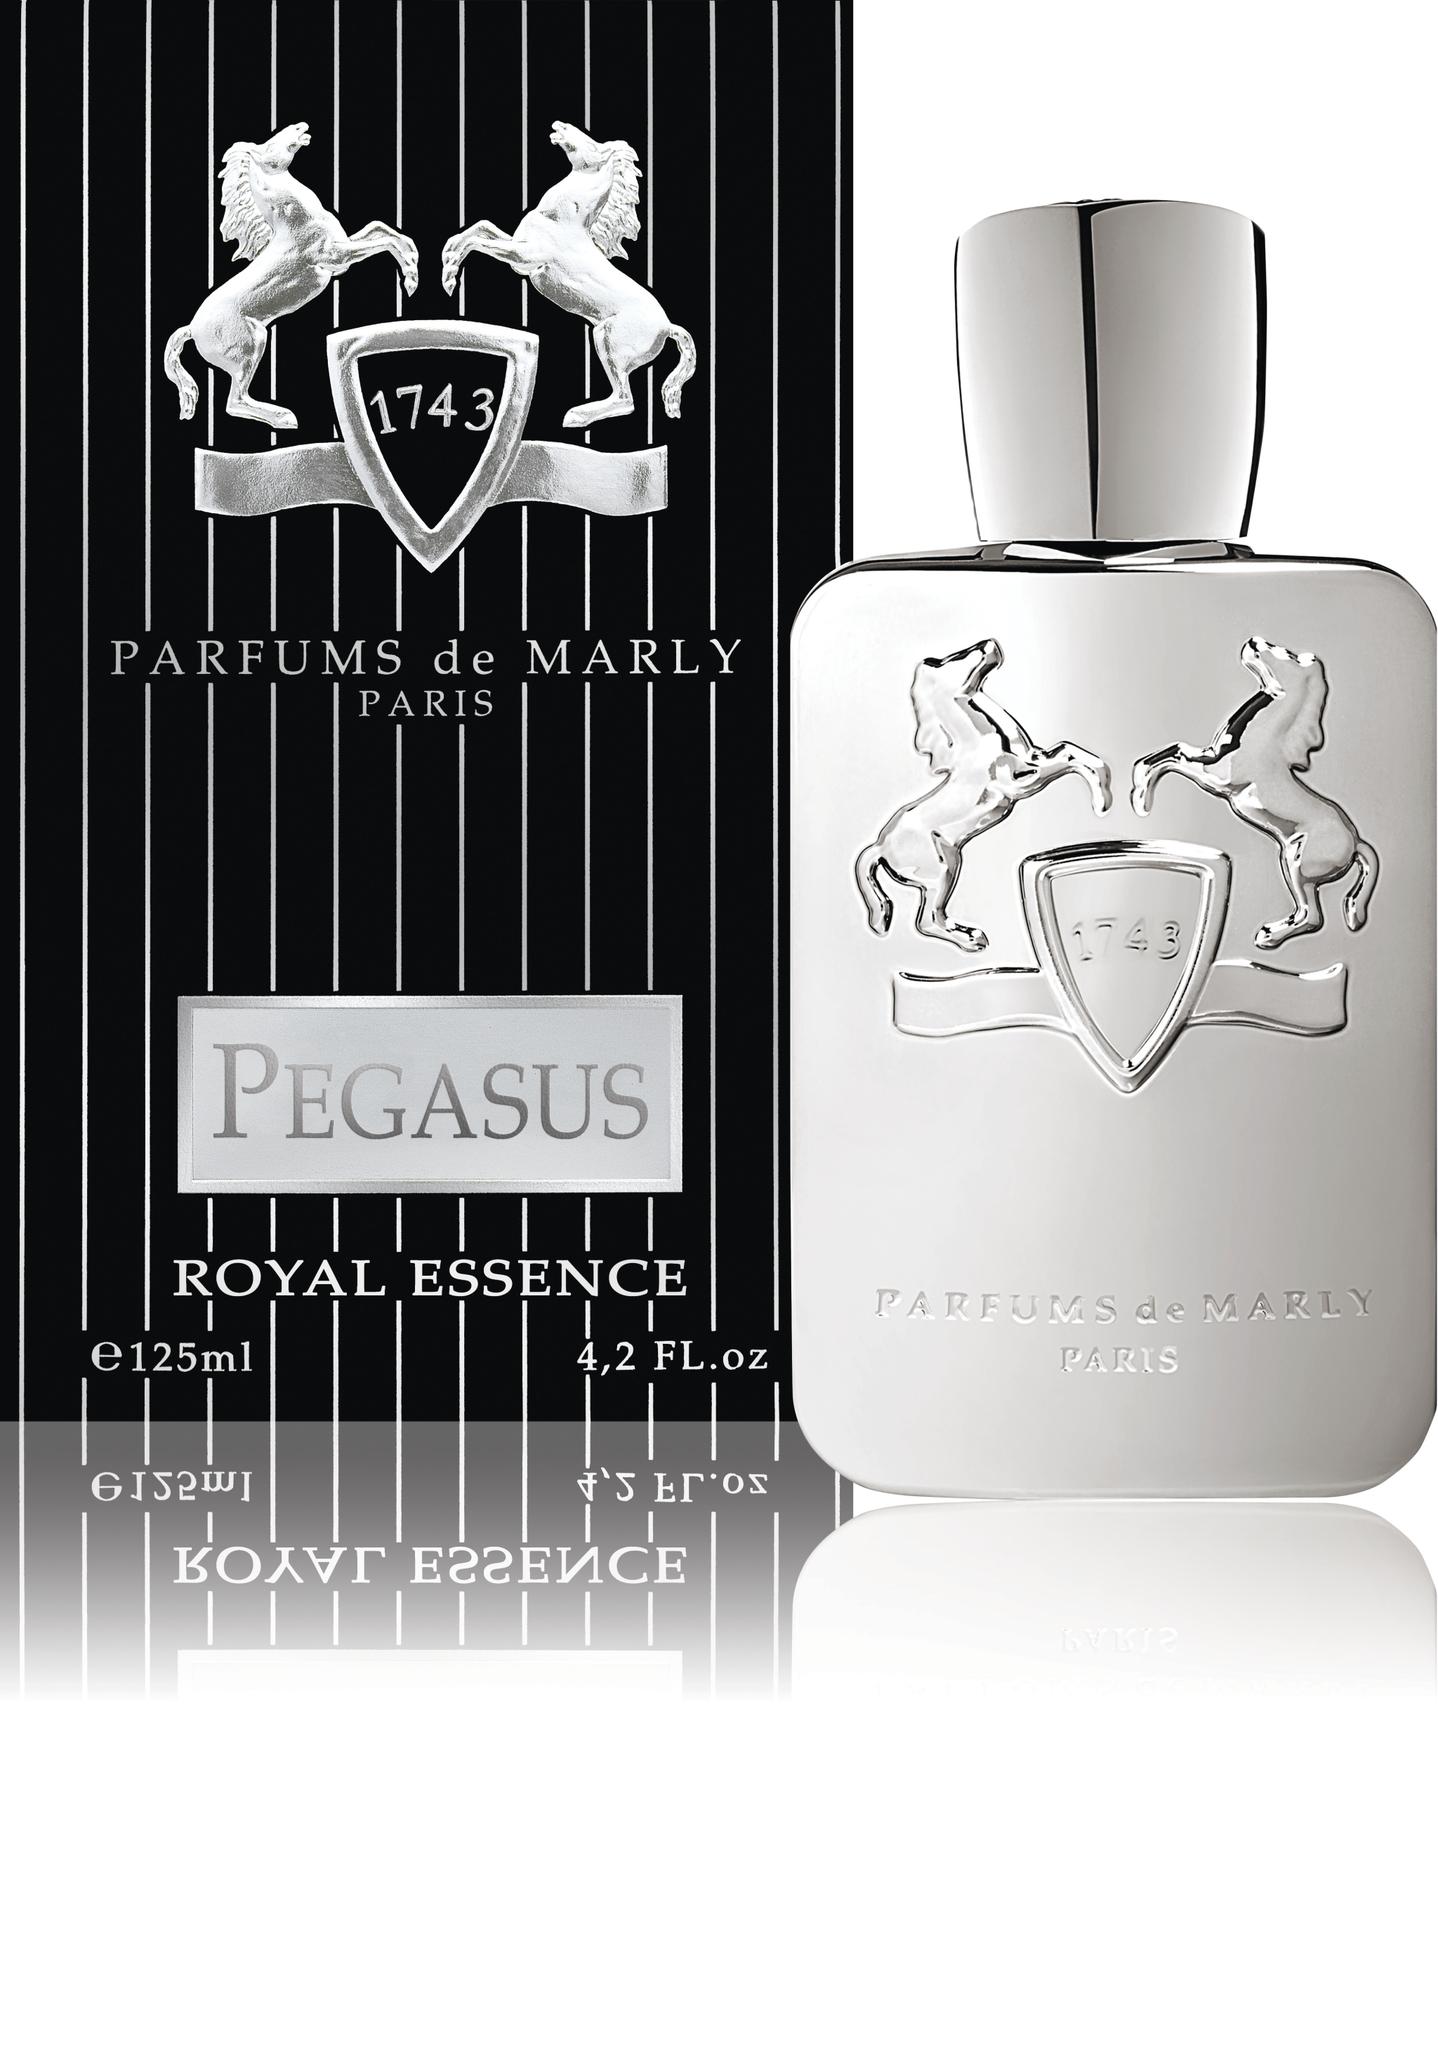 Parfums de Marly Pegasus EDP, 125 ml